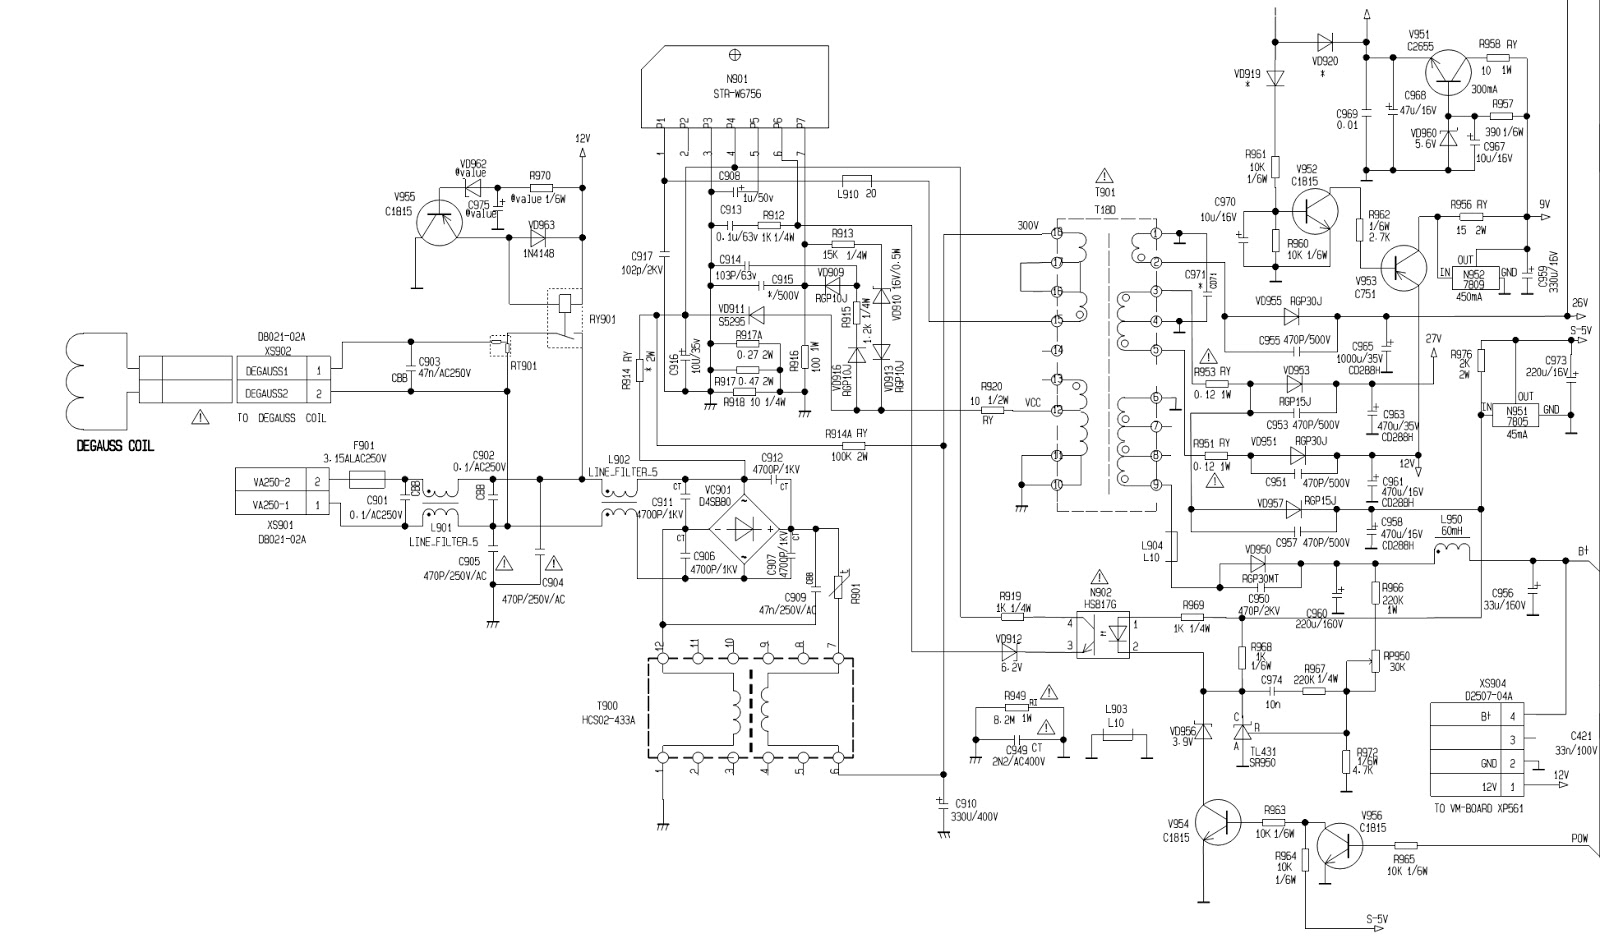 hight resolution of toshiba air conditioner wiring diagram wiring diagram main pc board mcc713 toshiba ras10sax user